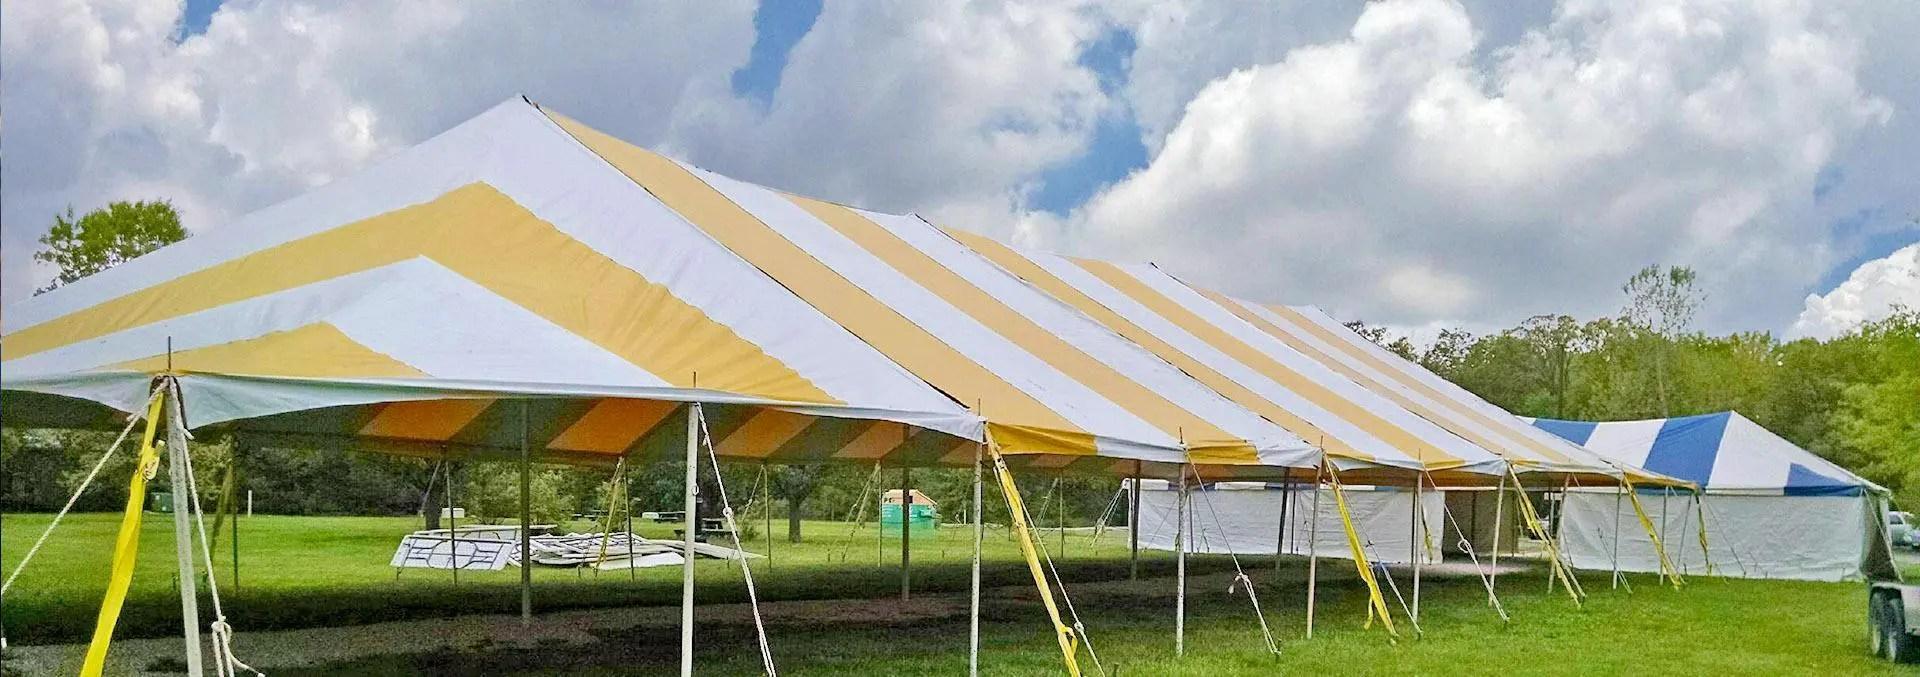 party tent rentals in topeka ks wedding tent rentals Wedding Party Tents for Rent in Kansas